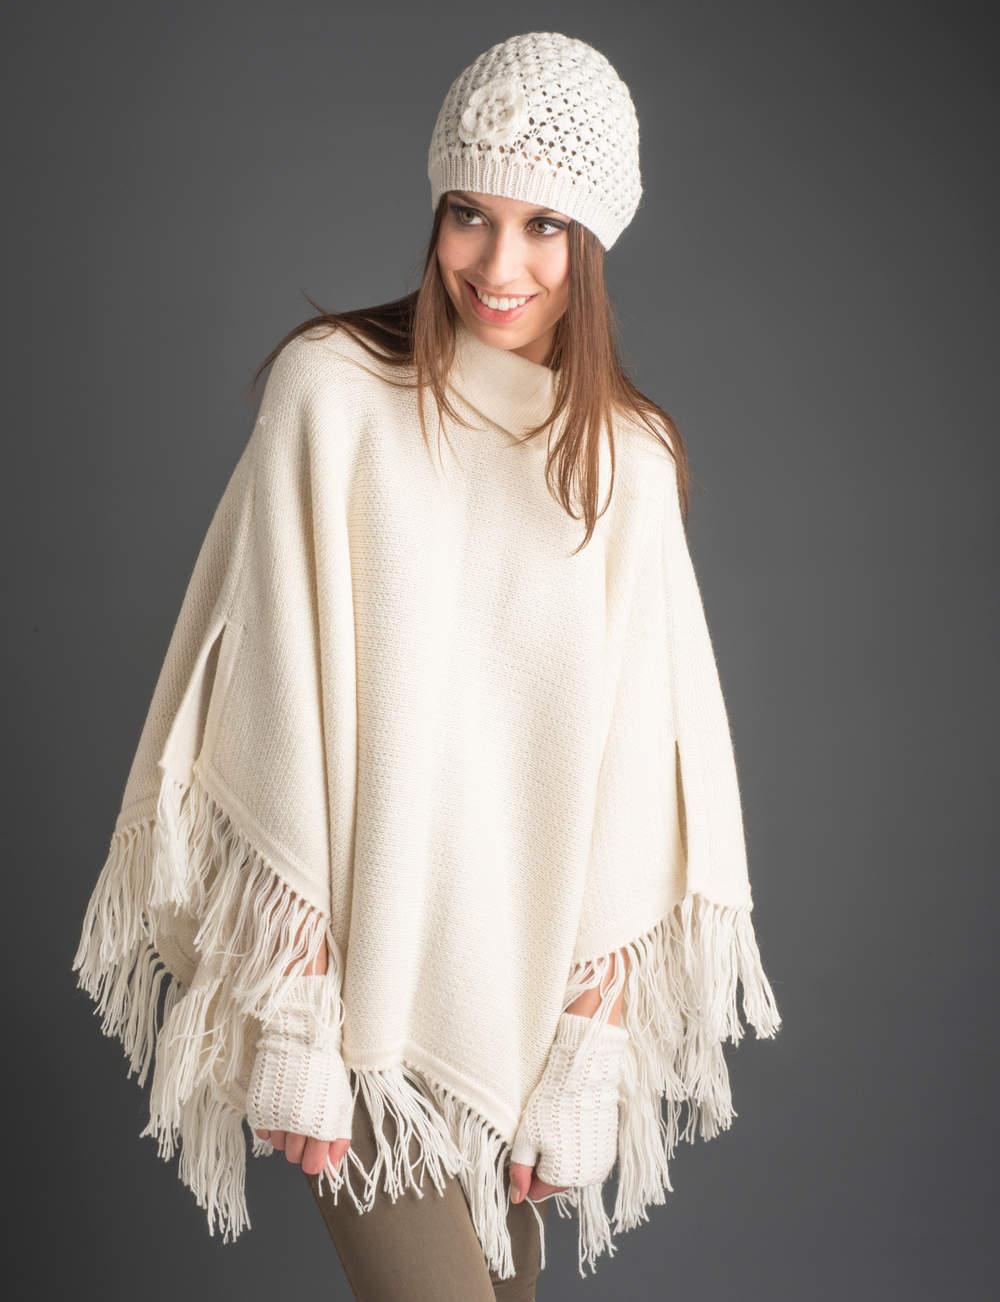 Blanc d'hiver